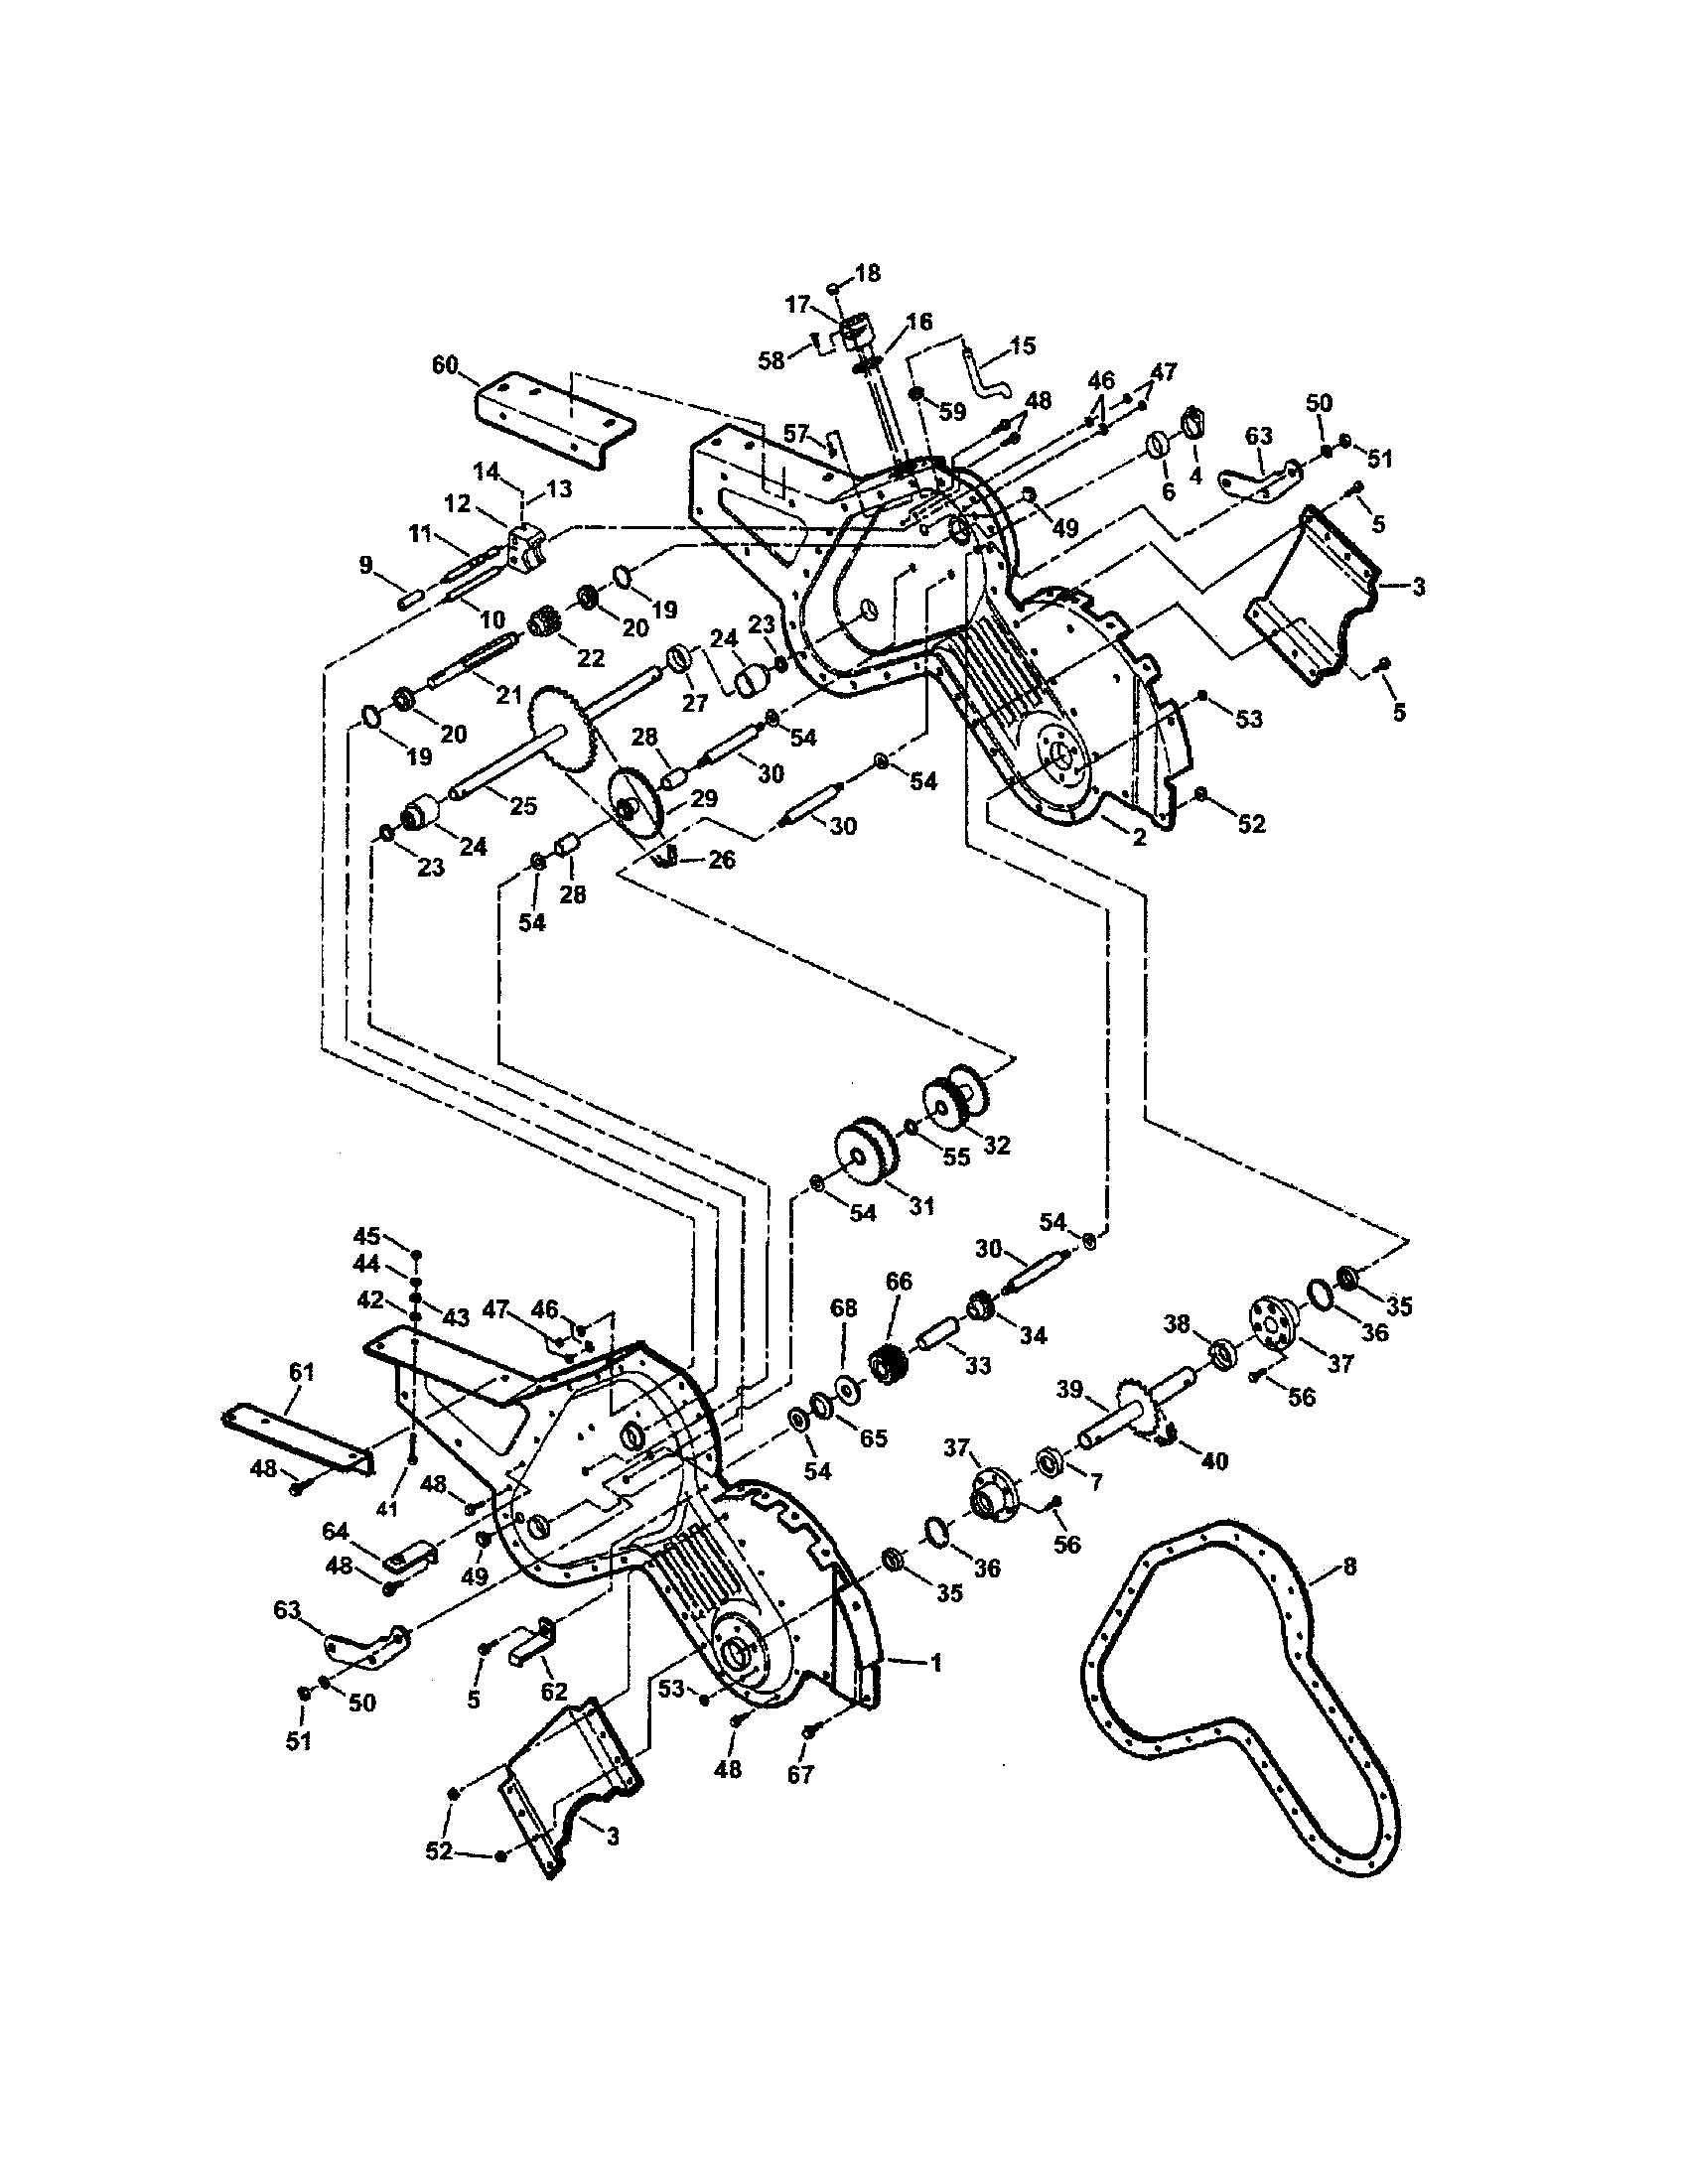 MAIN CASE (SERIES 4 & 5) Diagram & Parts List for Model